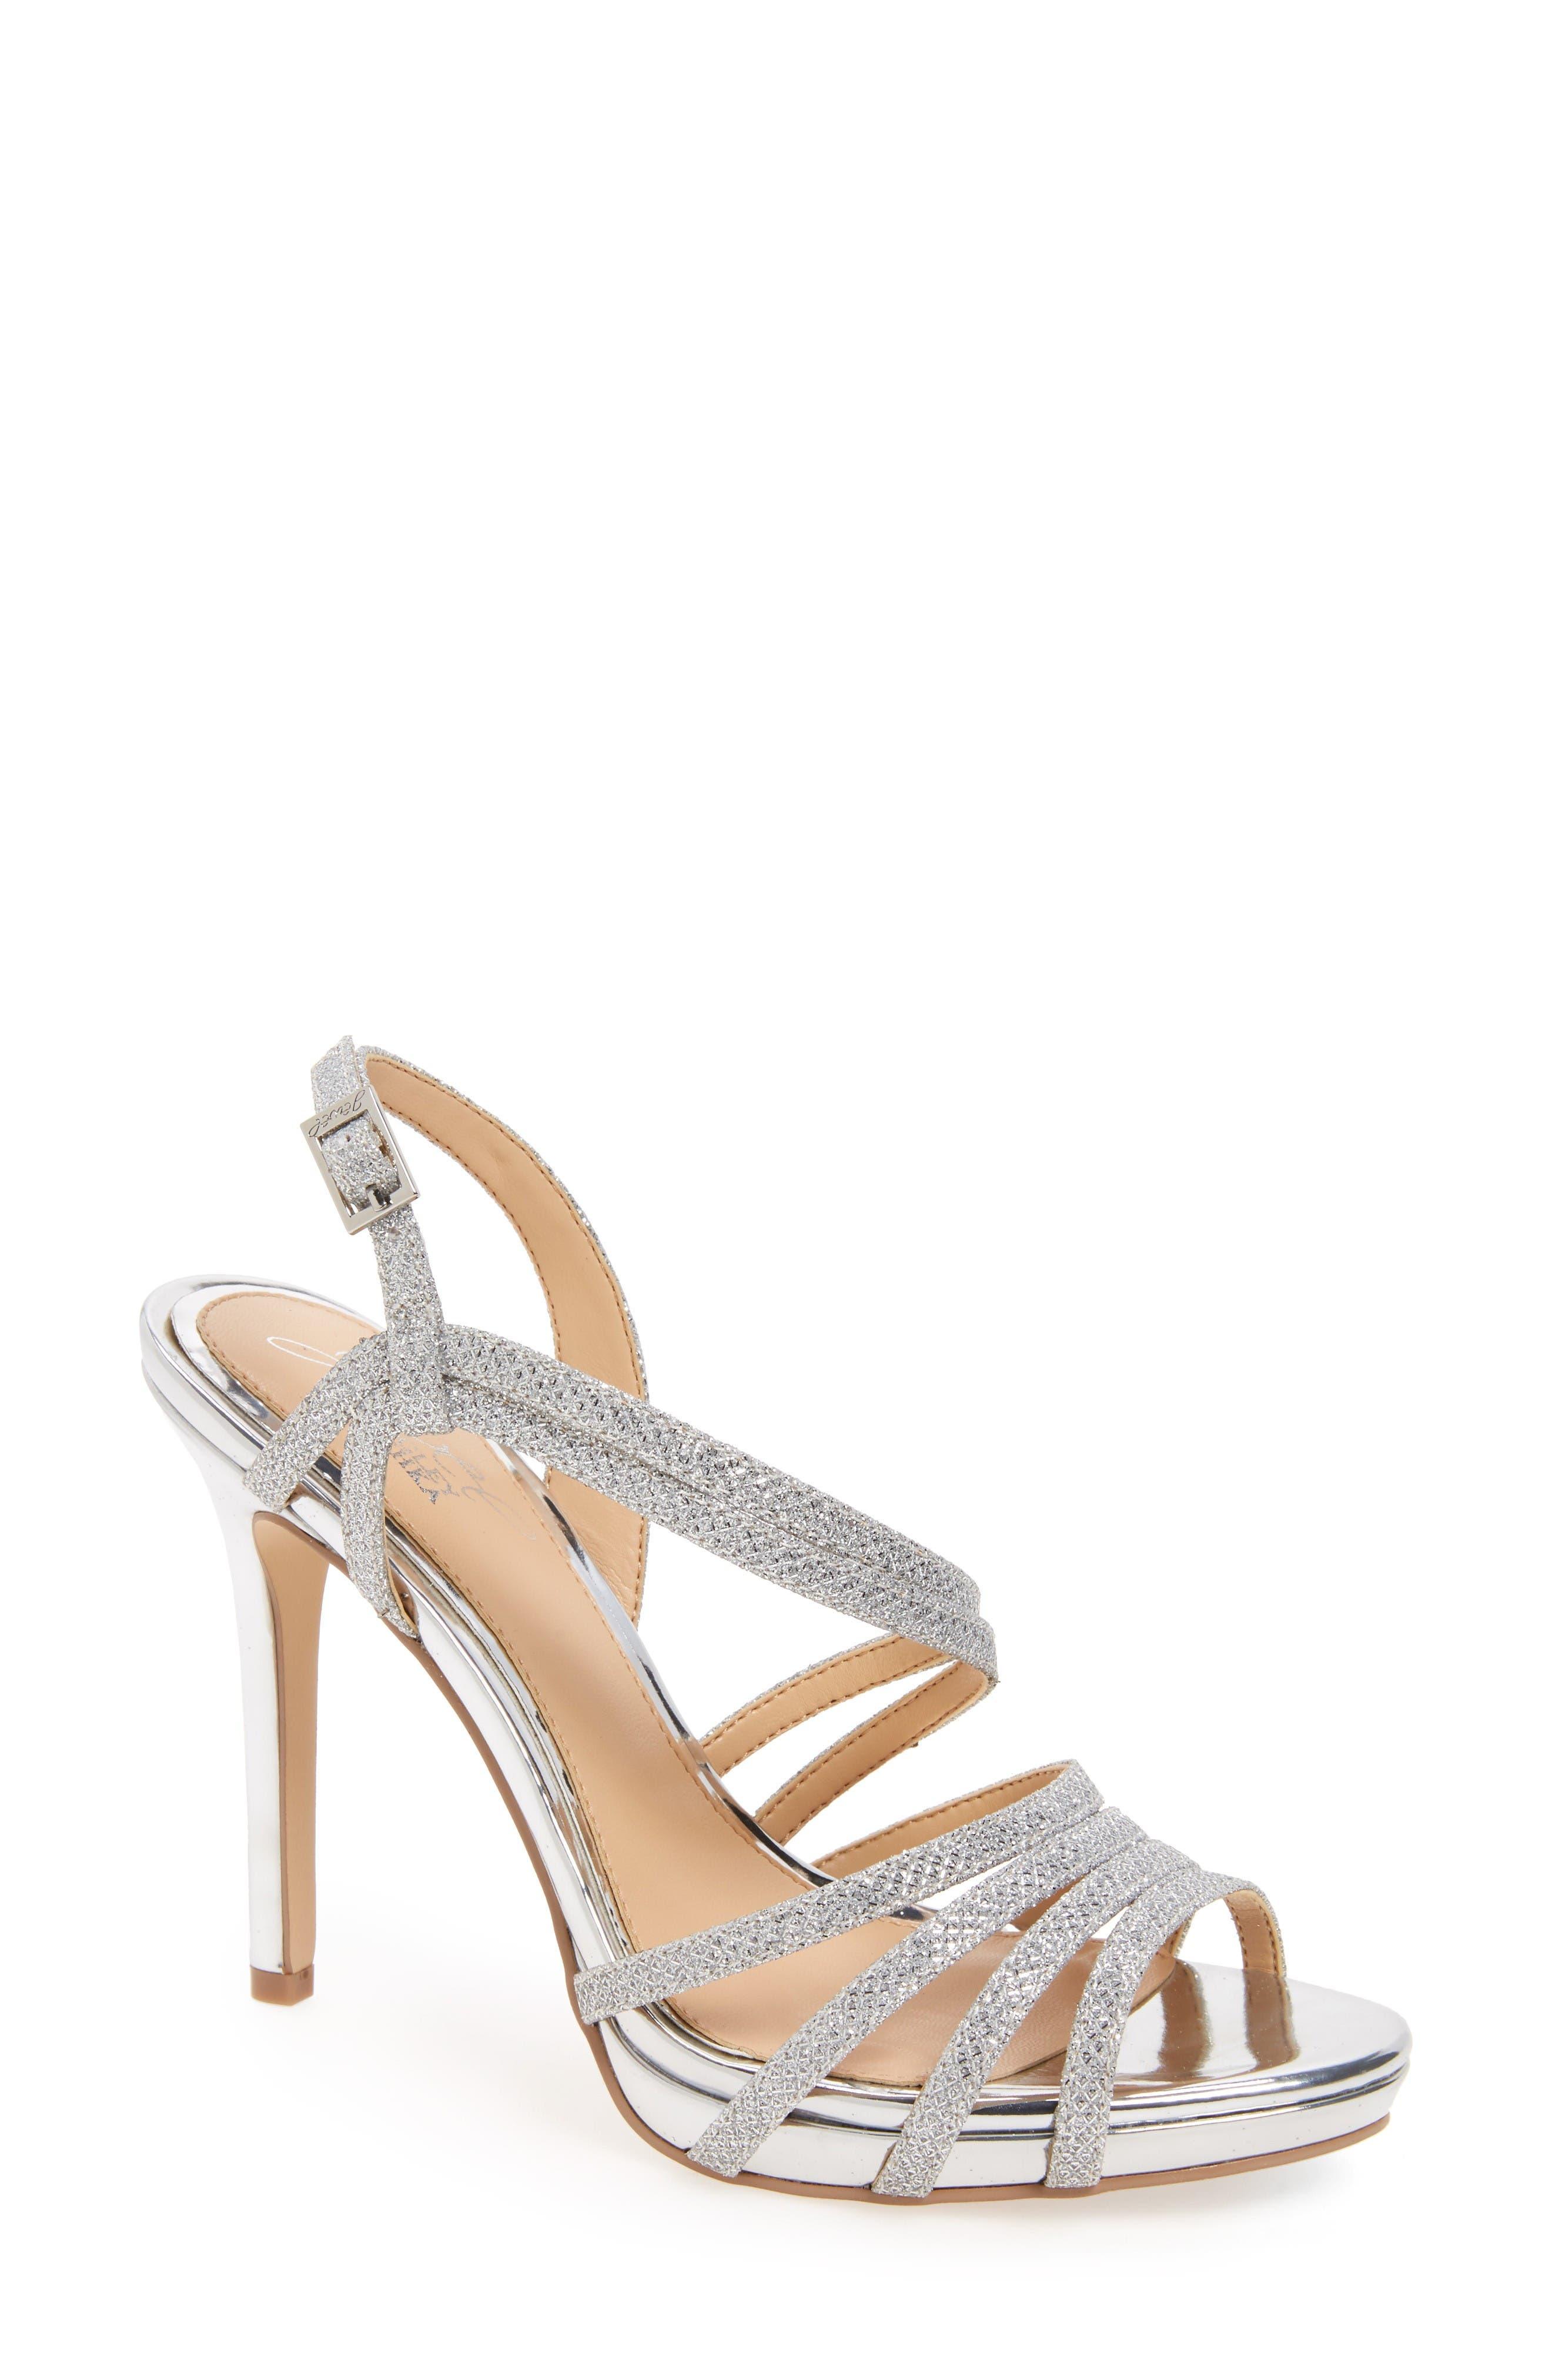 Jewel Badgley Mischka Humble Strappy Sandal (Women)